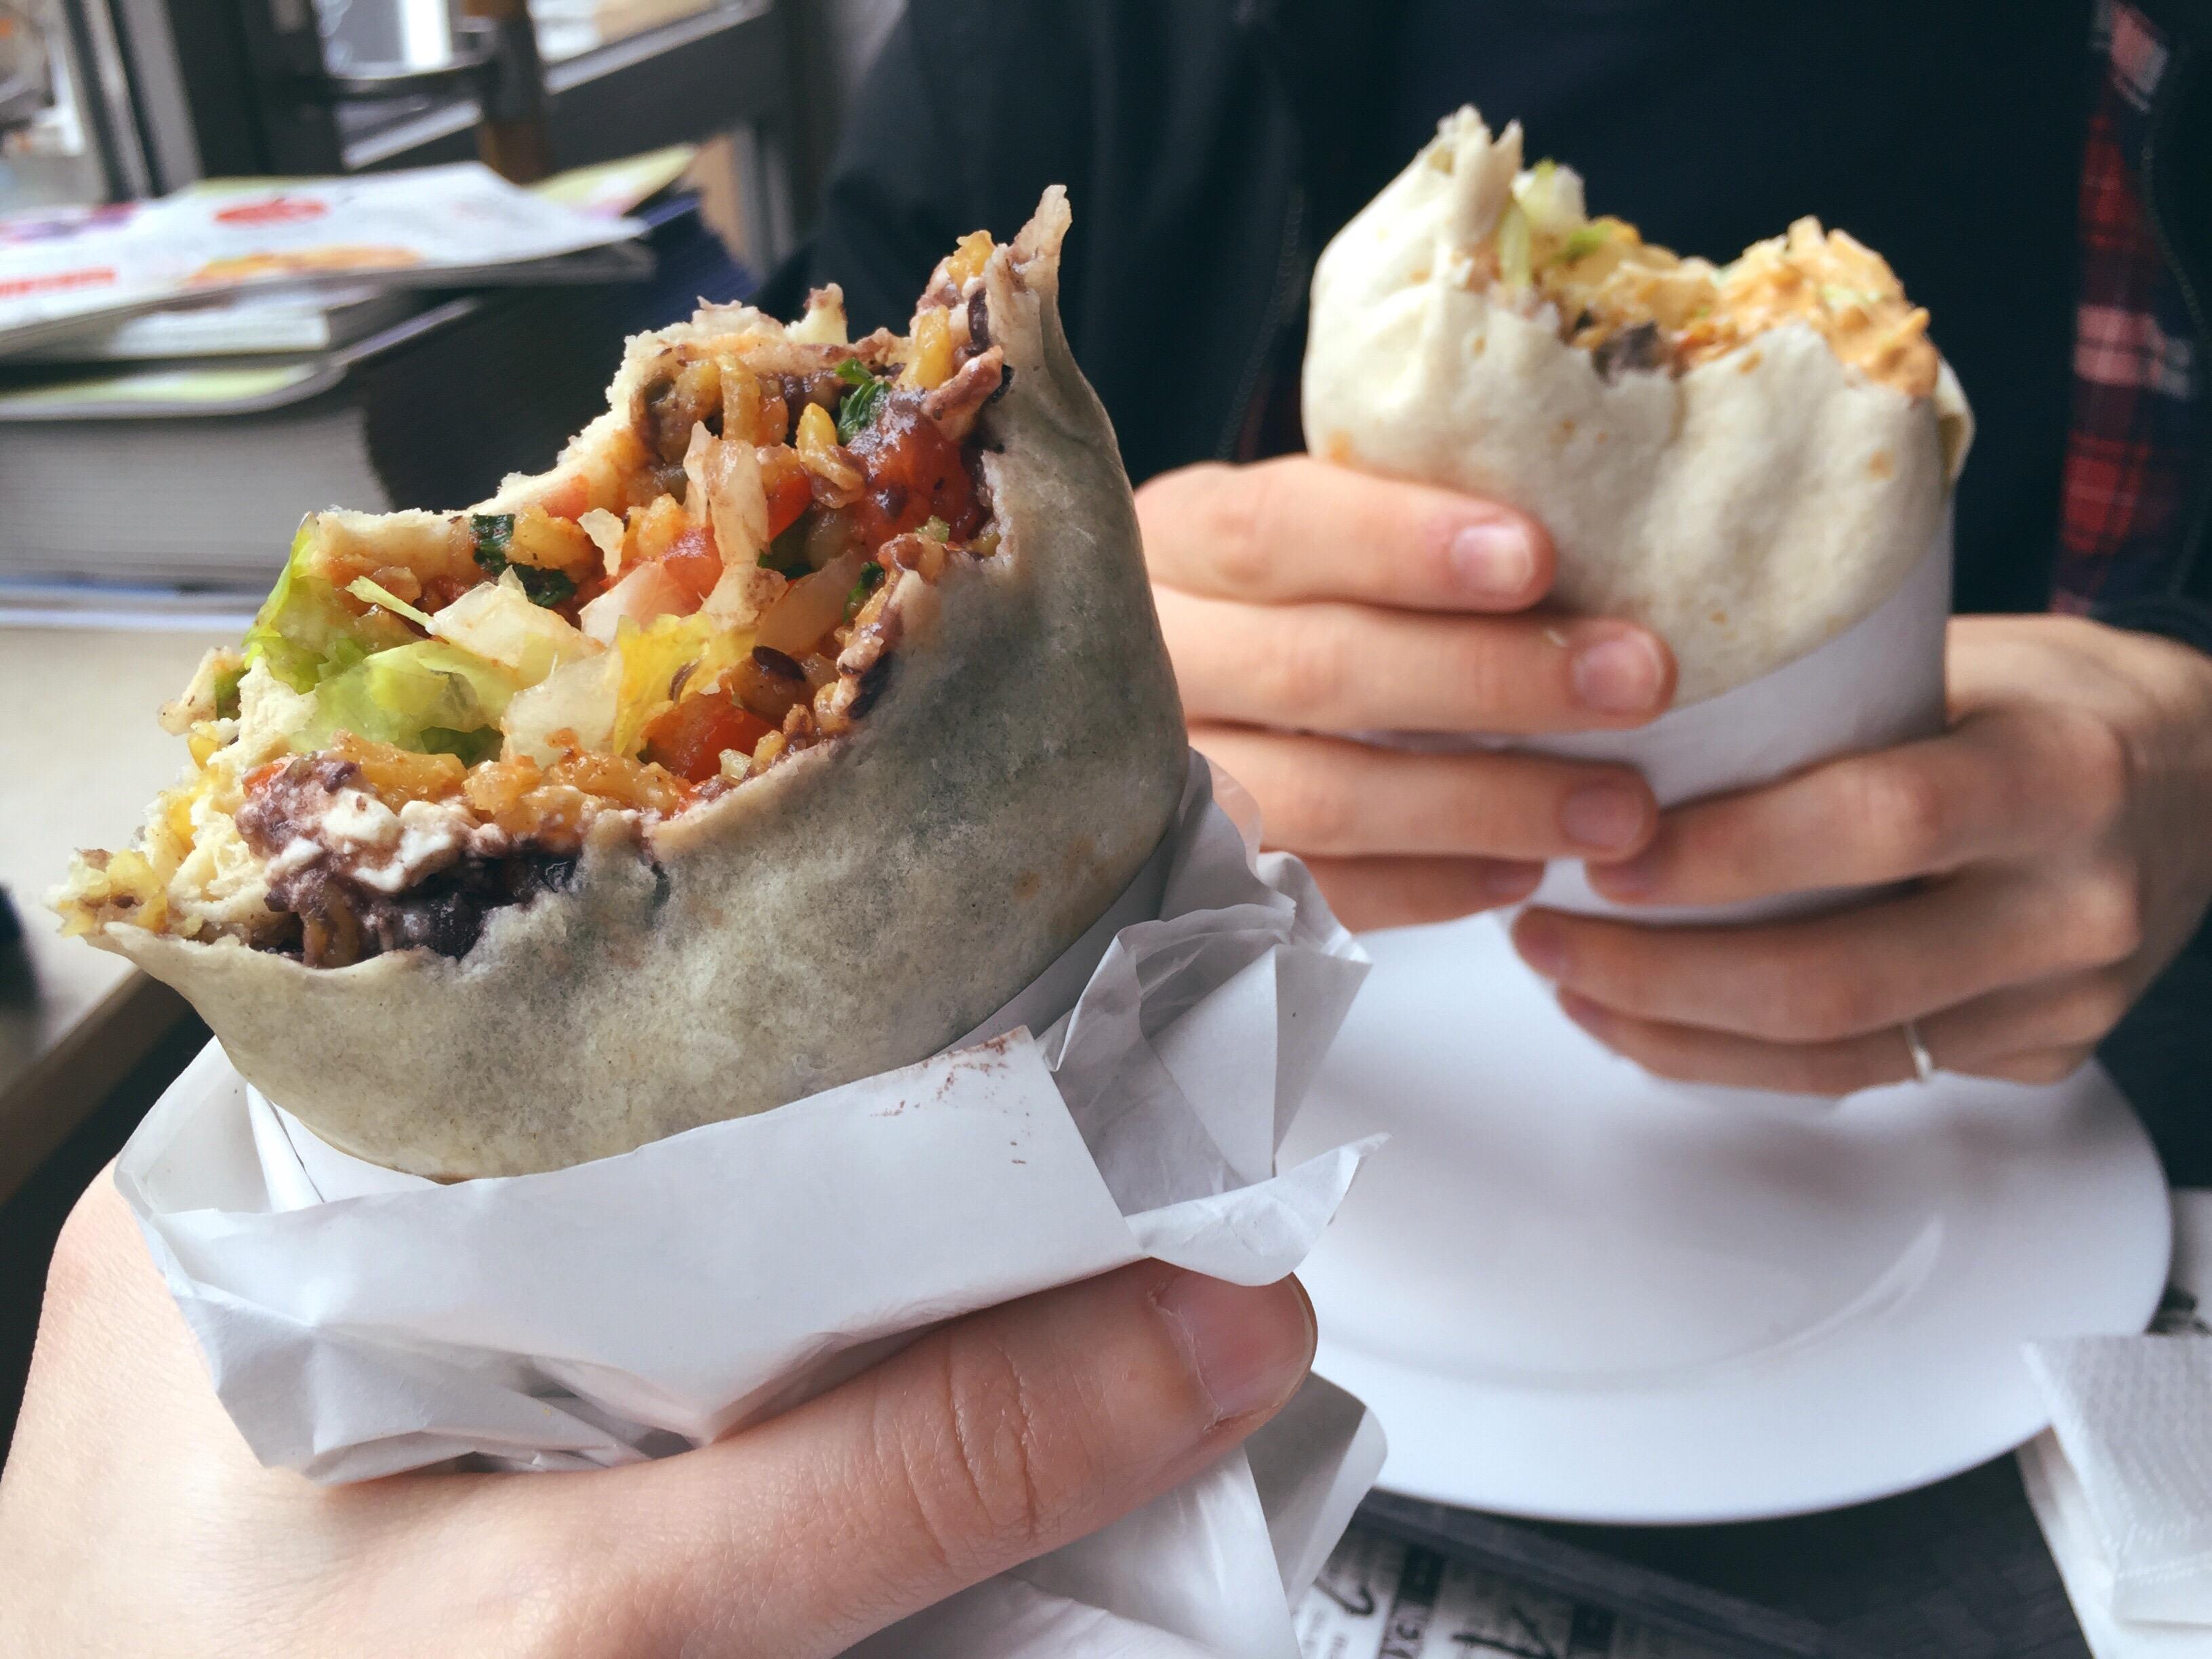 National Burrito Day 2019 Get Free Burrito Deals Discounts Money